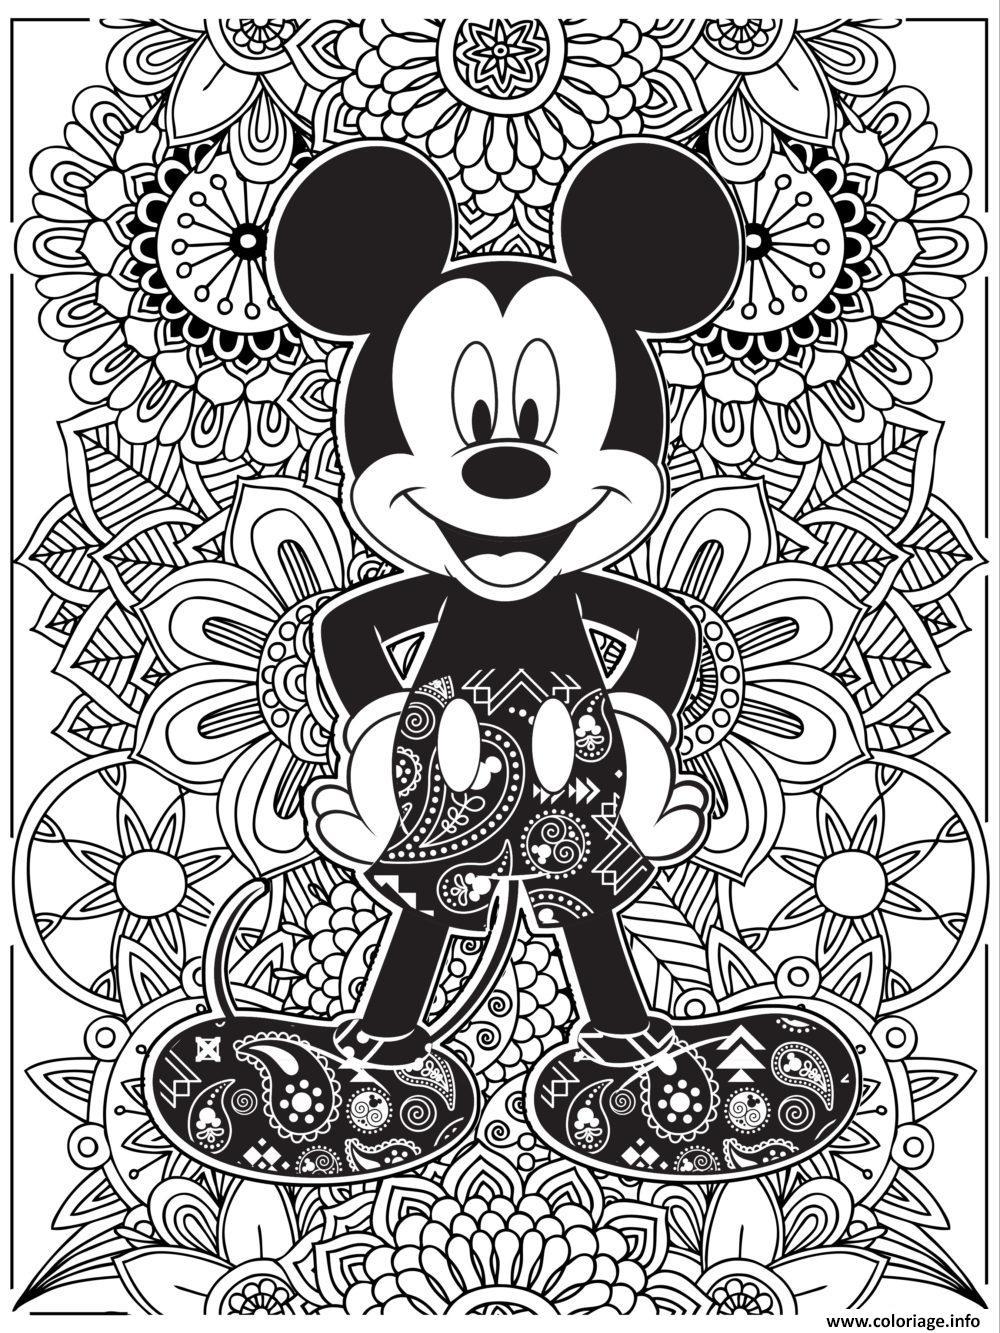 Coloriage Mandala Disney Mickeymouse Hd Jecolorie Com